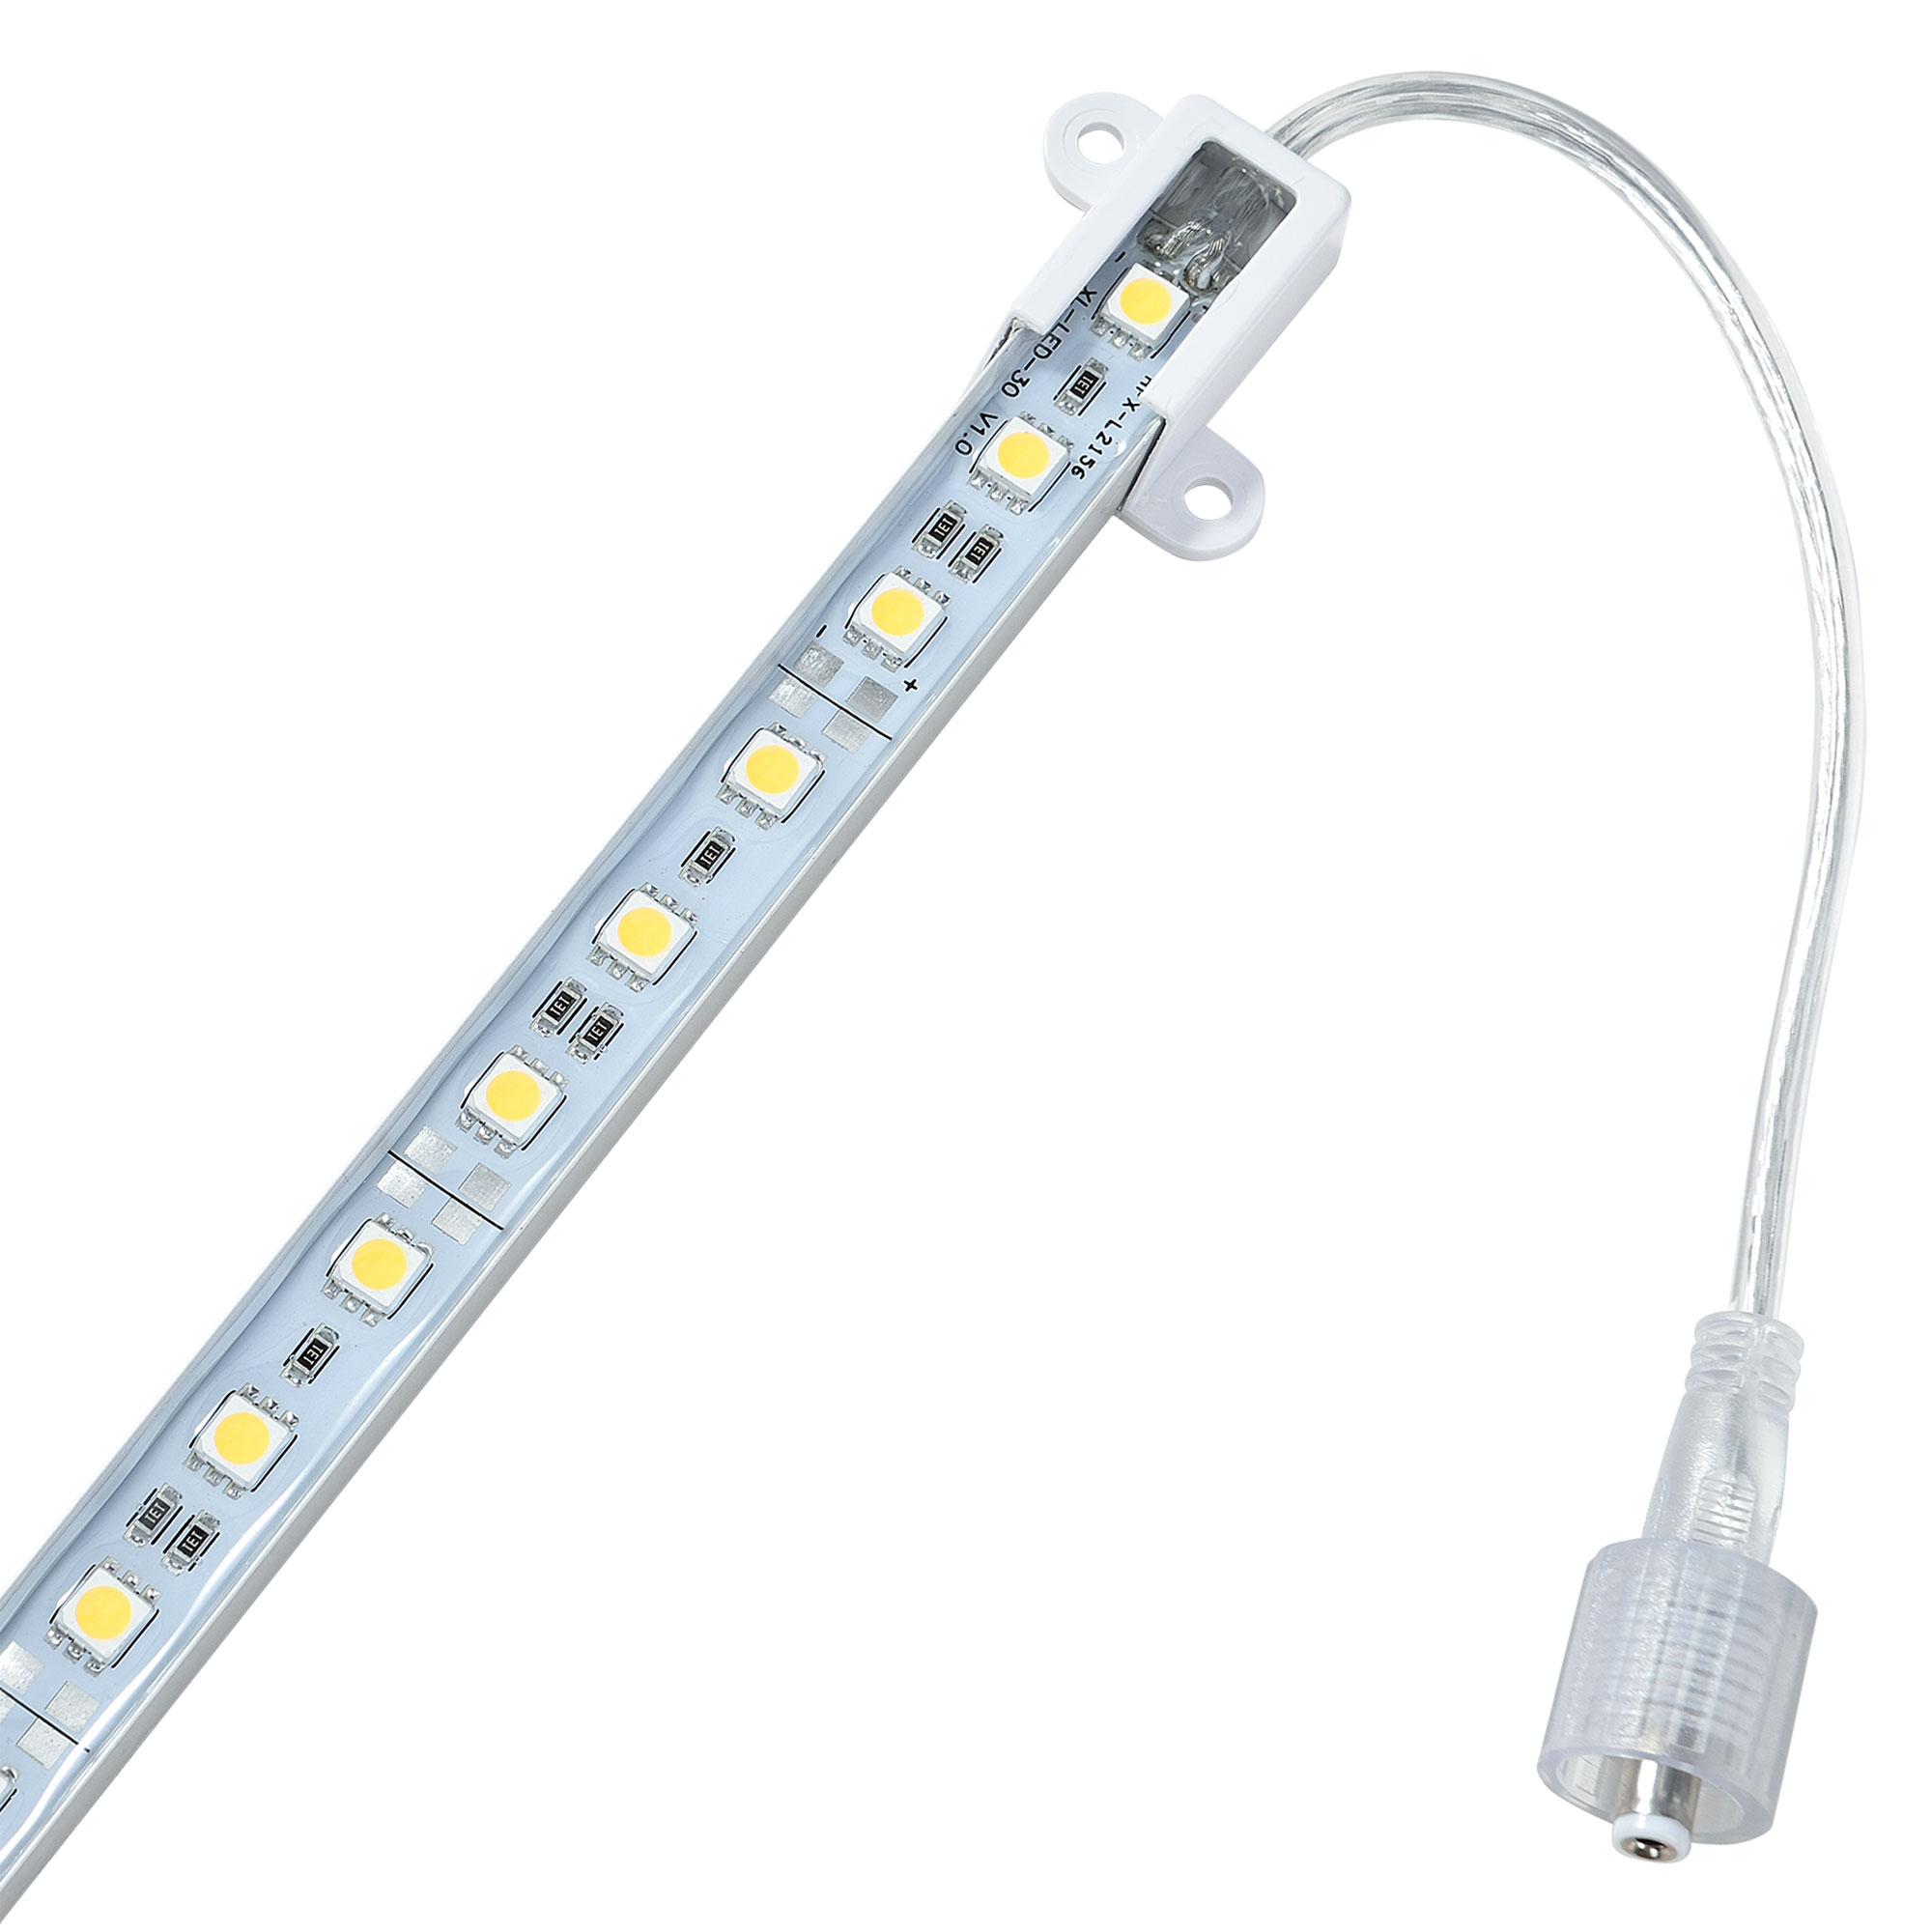 2x100cm alluminio led barra luminosa alimentatore - Barra led bagno ...